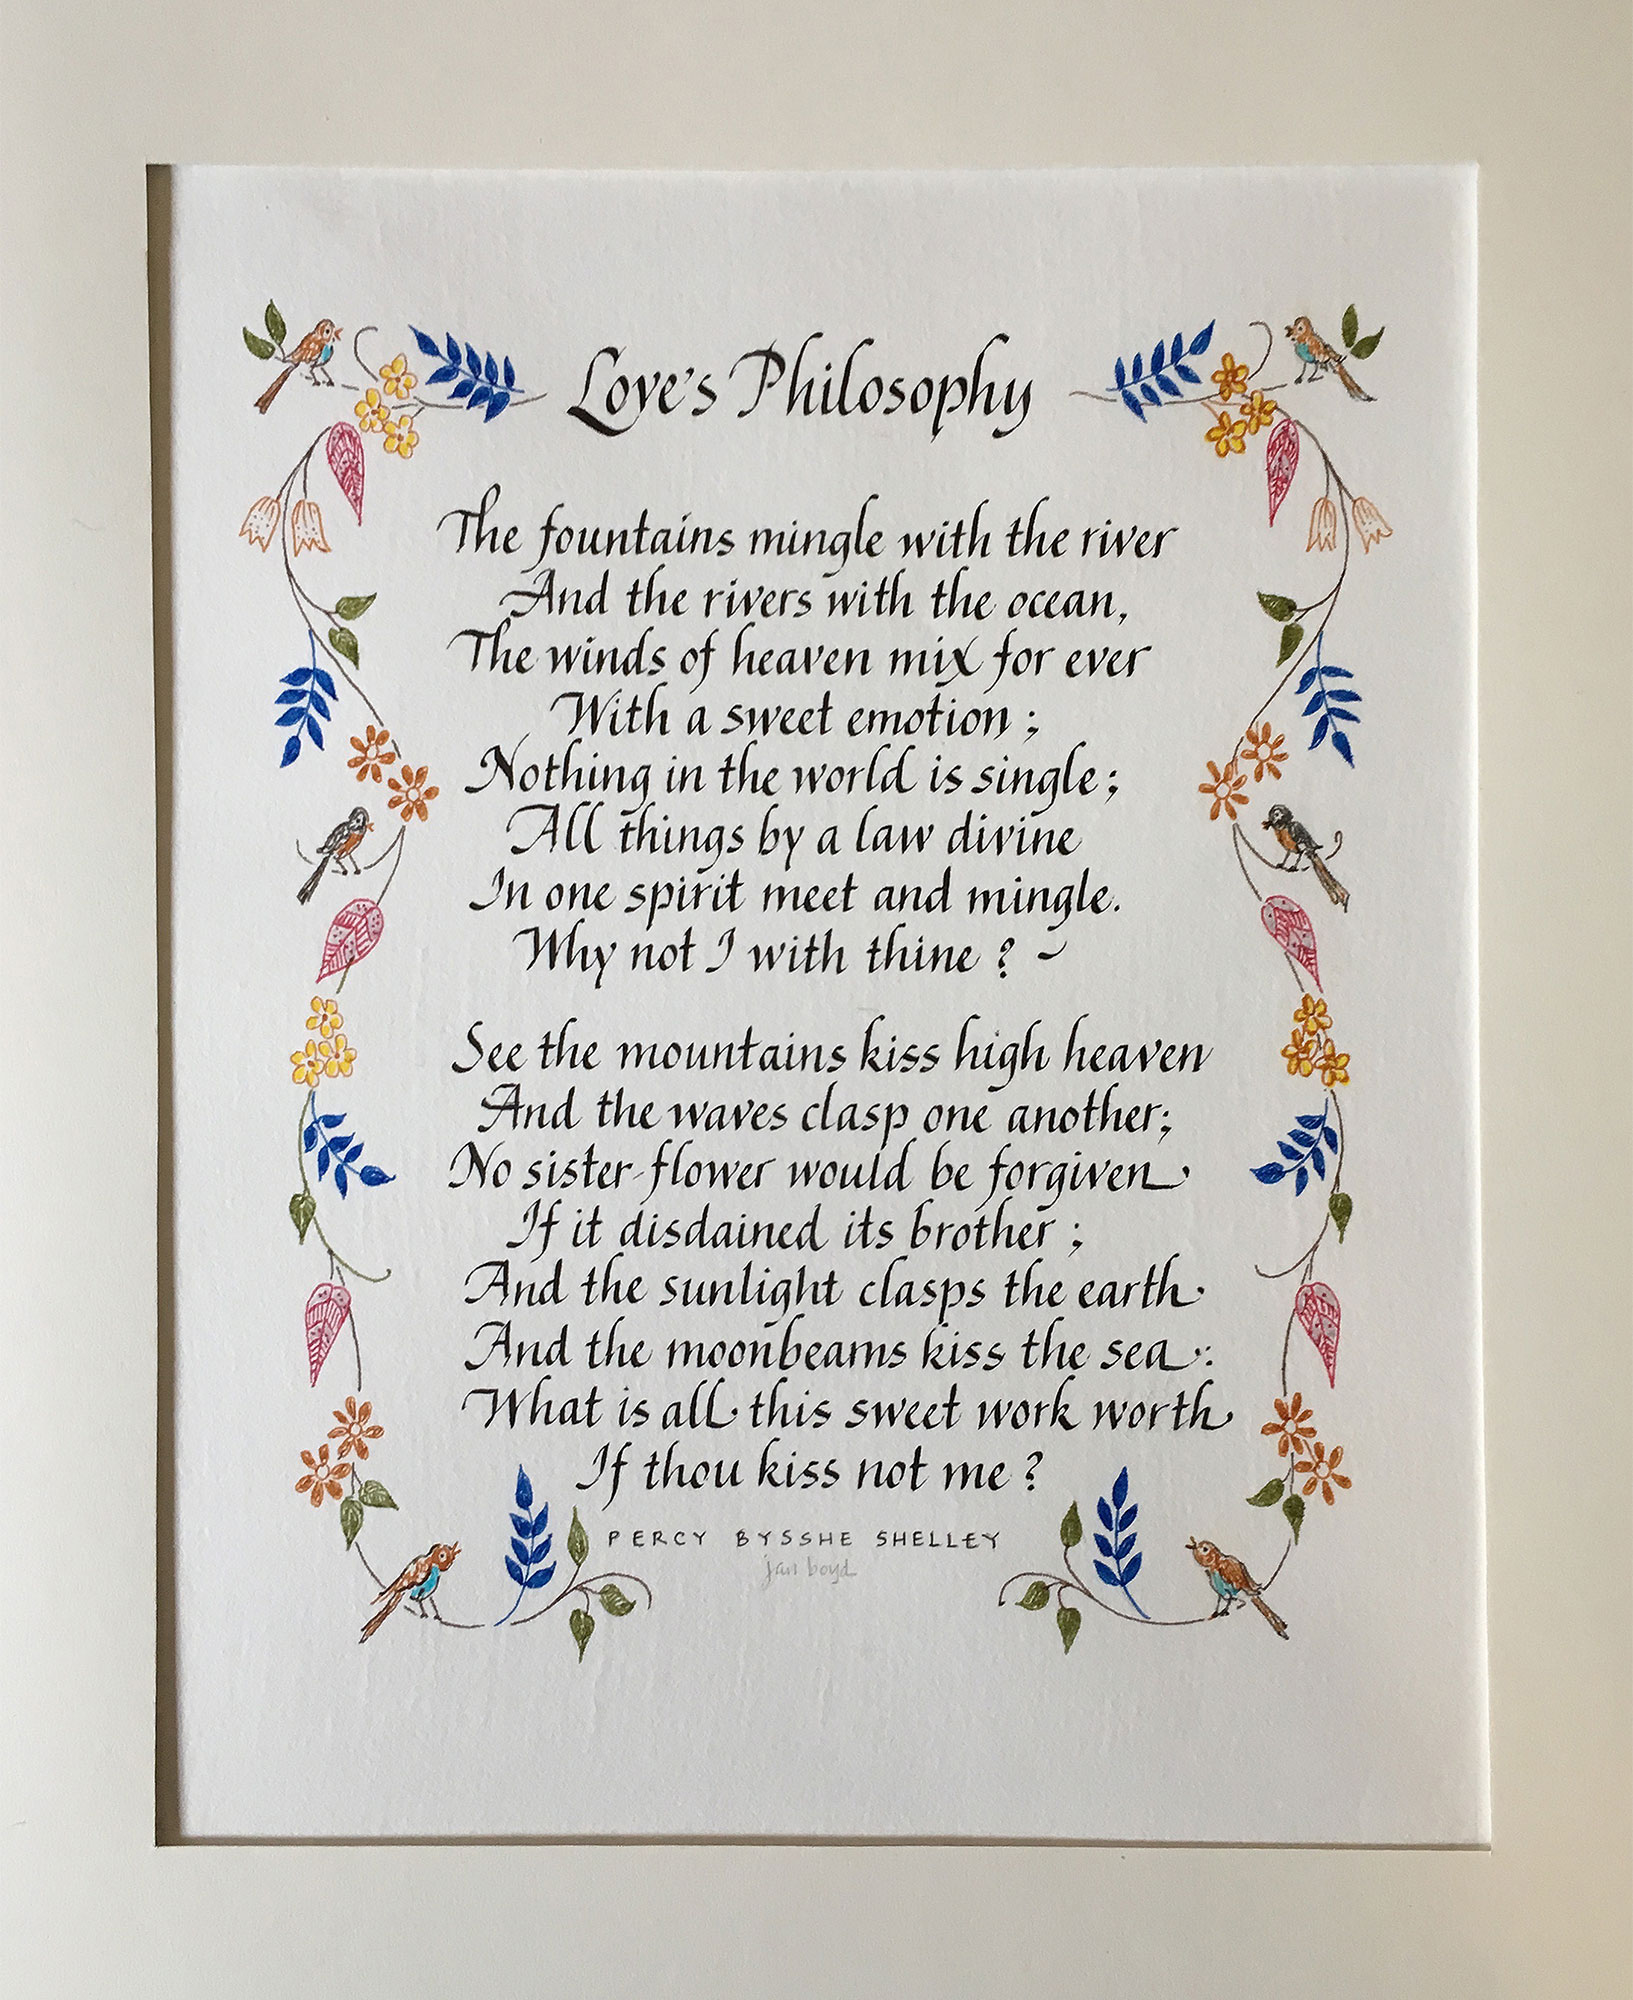 Jan Boyd - Poem - Love's Philosophy